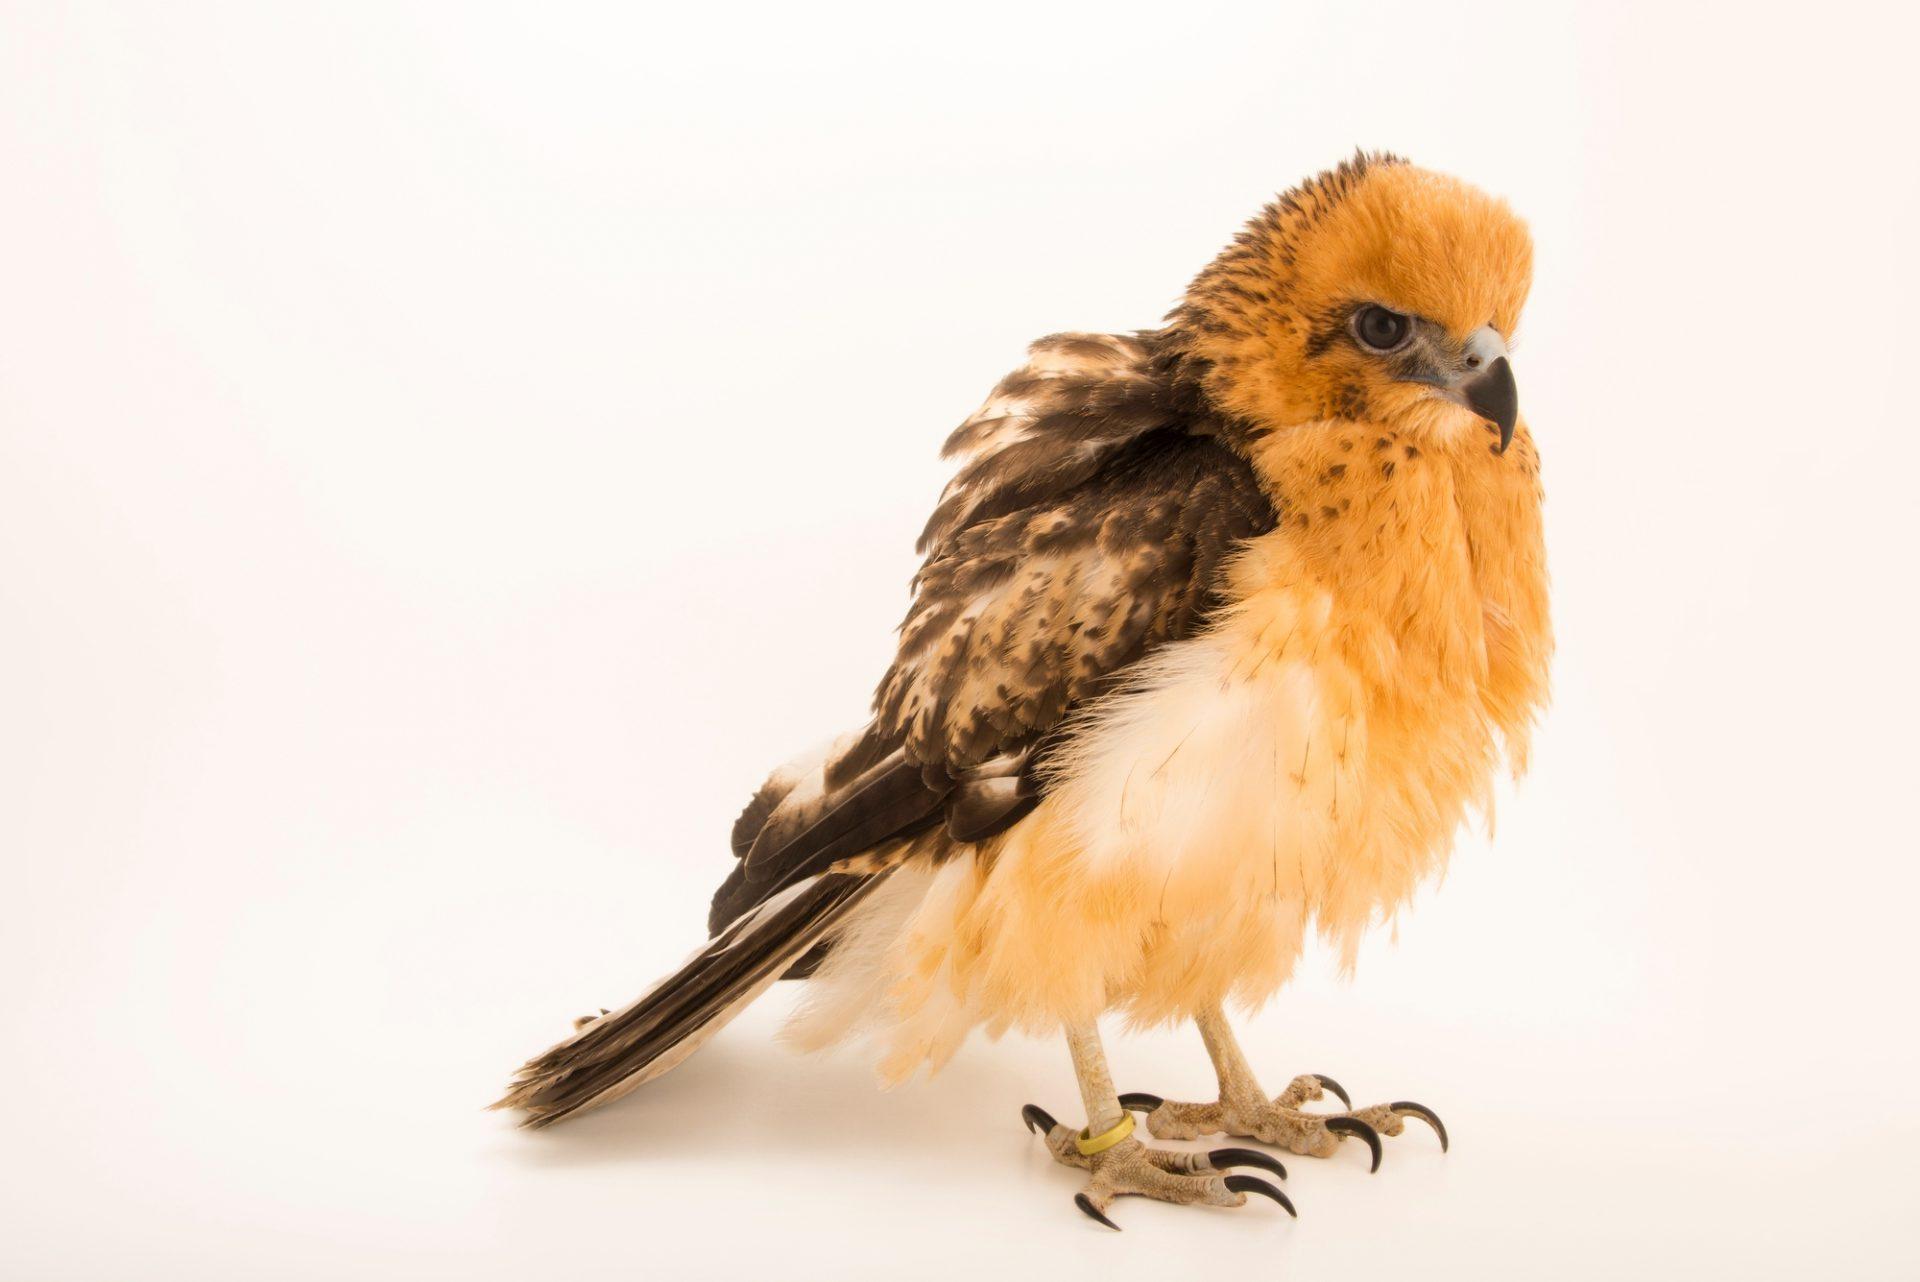 Photo: A 13-week, female Hawaiian hawk (Buteo solitarius) named Wahine (Hawaiian for little girl) at Sia, the Comanche Nation Ethno-Ornithological Initiative.